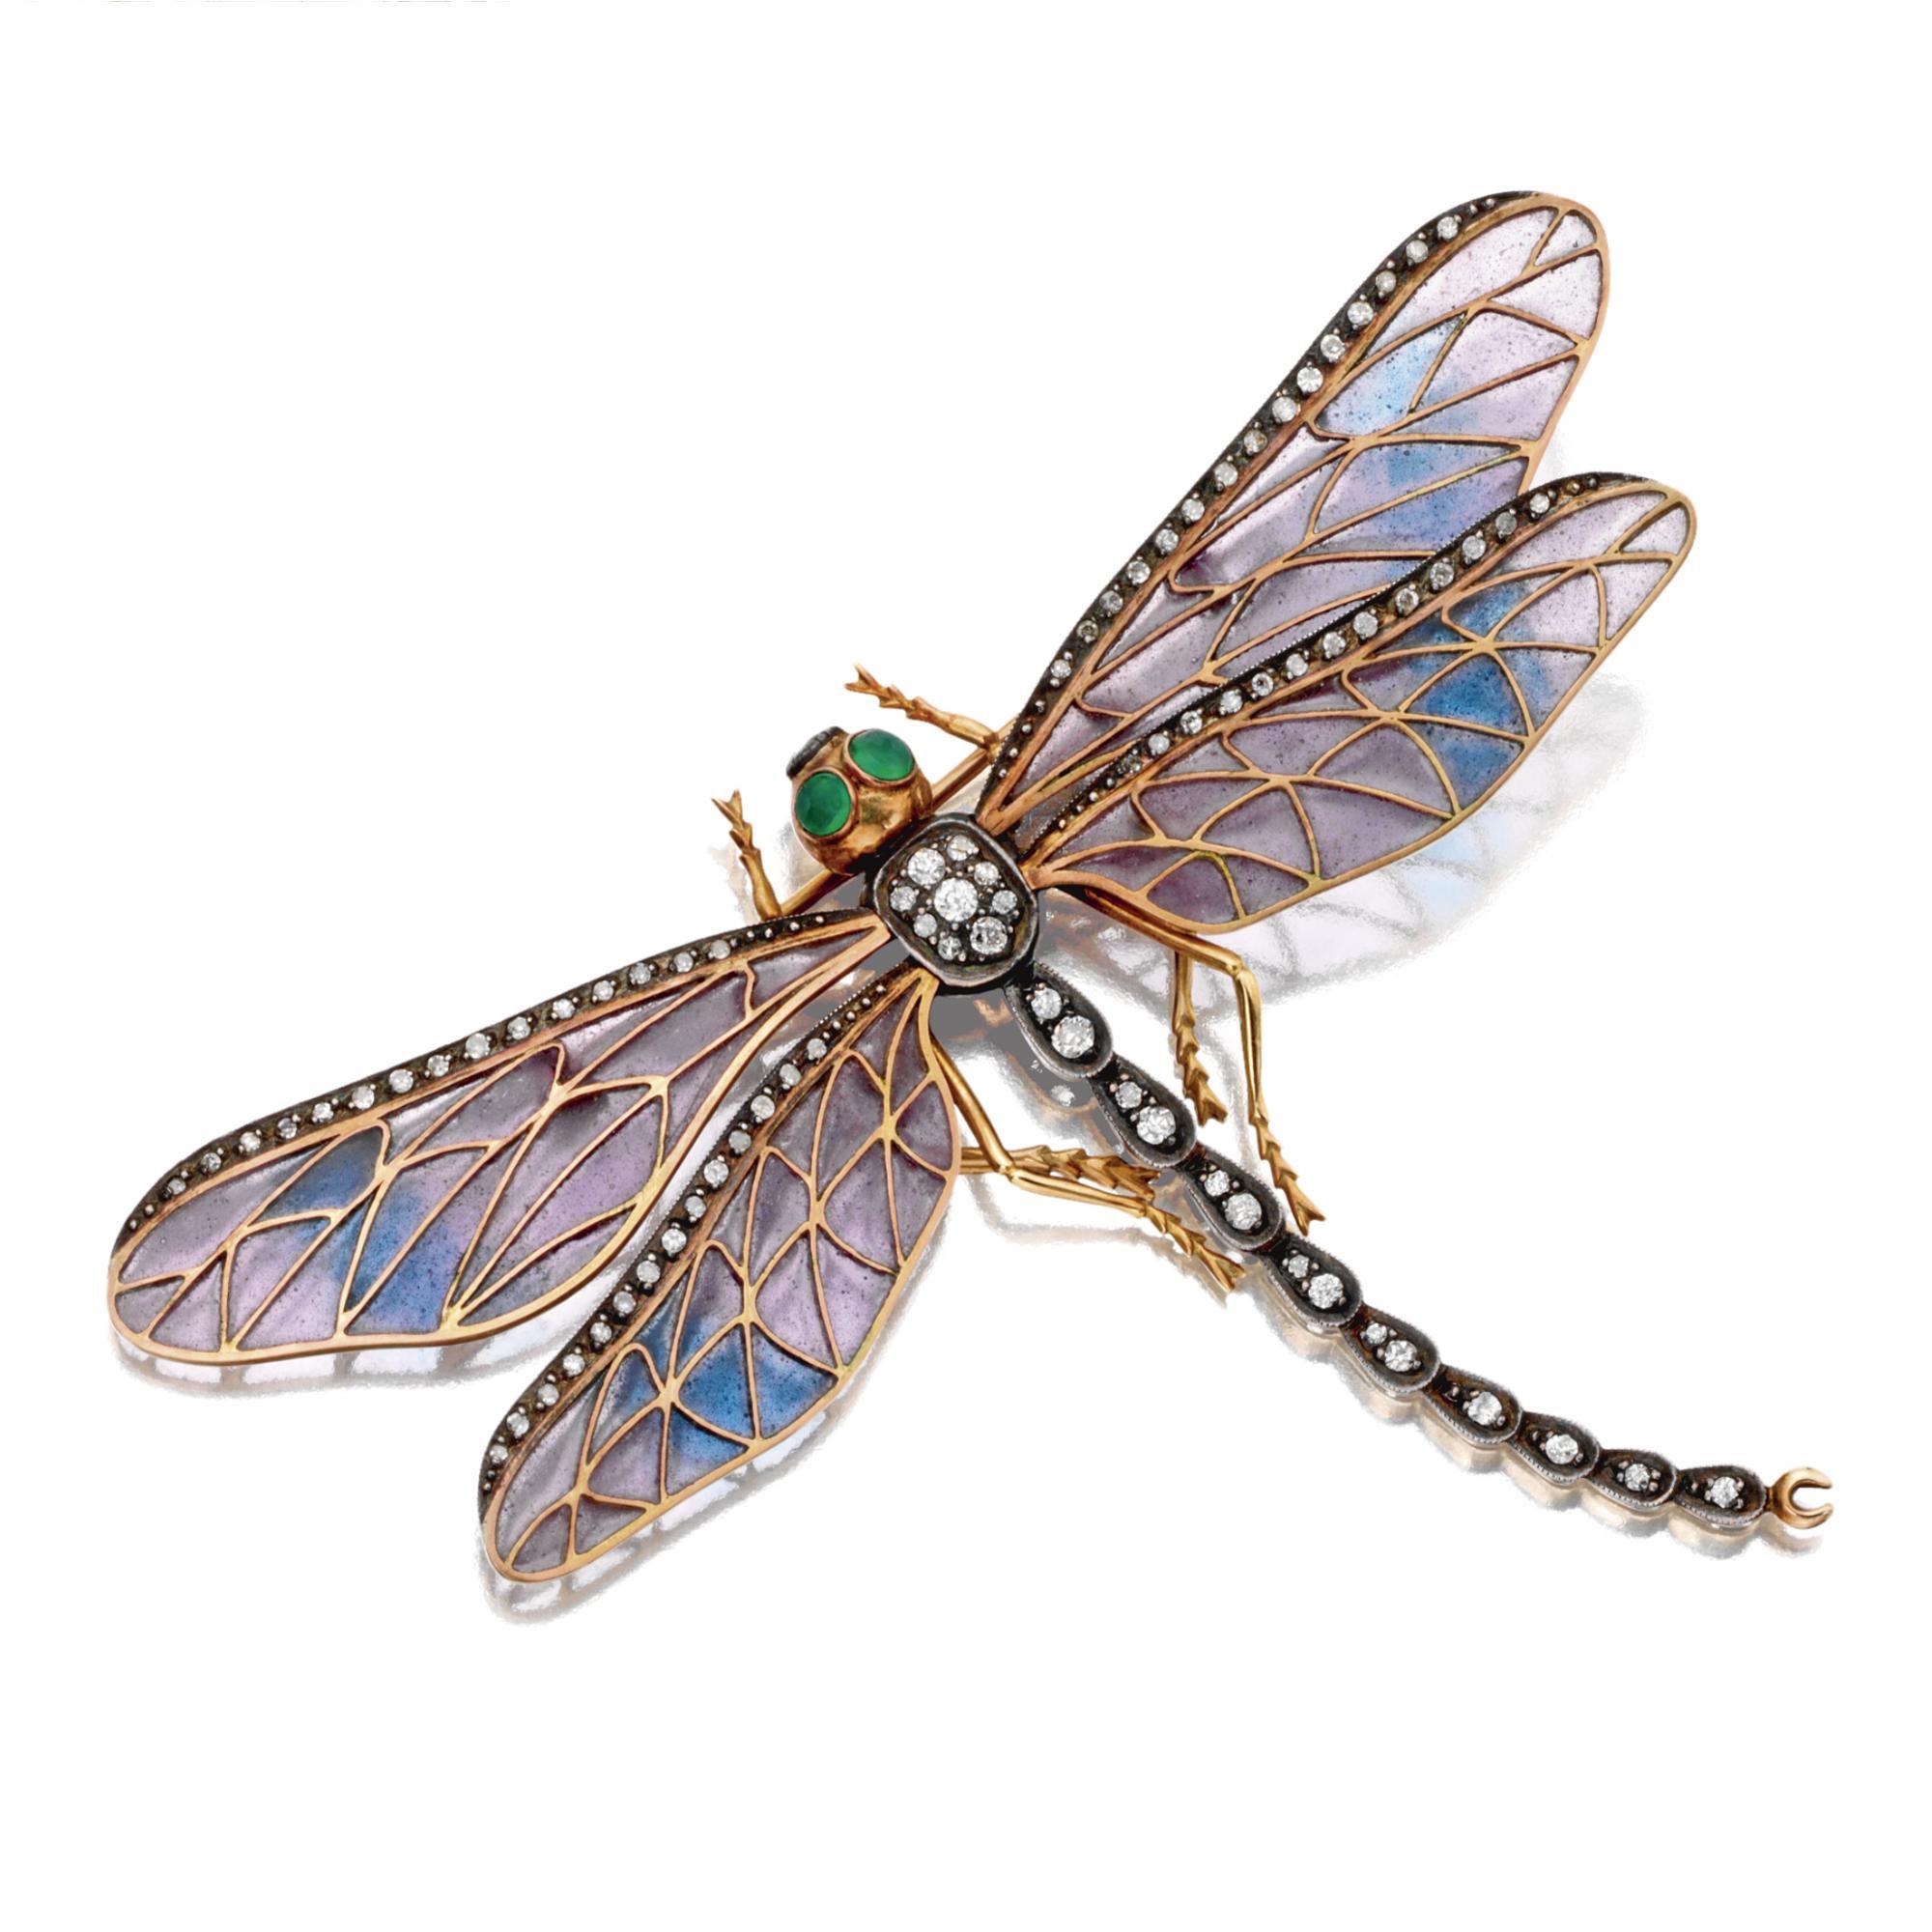 720f24dd093 ART NOUVEAU PLIQUE-À-JOUR ENAMEL AND DIAMOND DRAGONFLY BROOCH, CIRCA 1900.  The wings of pale lavender and turquoise plique-à-jour enamel edged in  single-cut ...